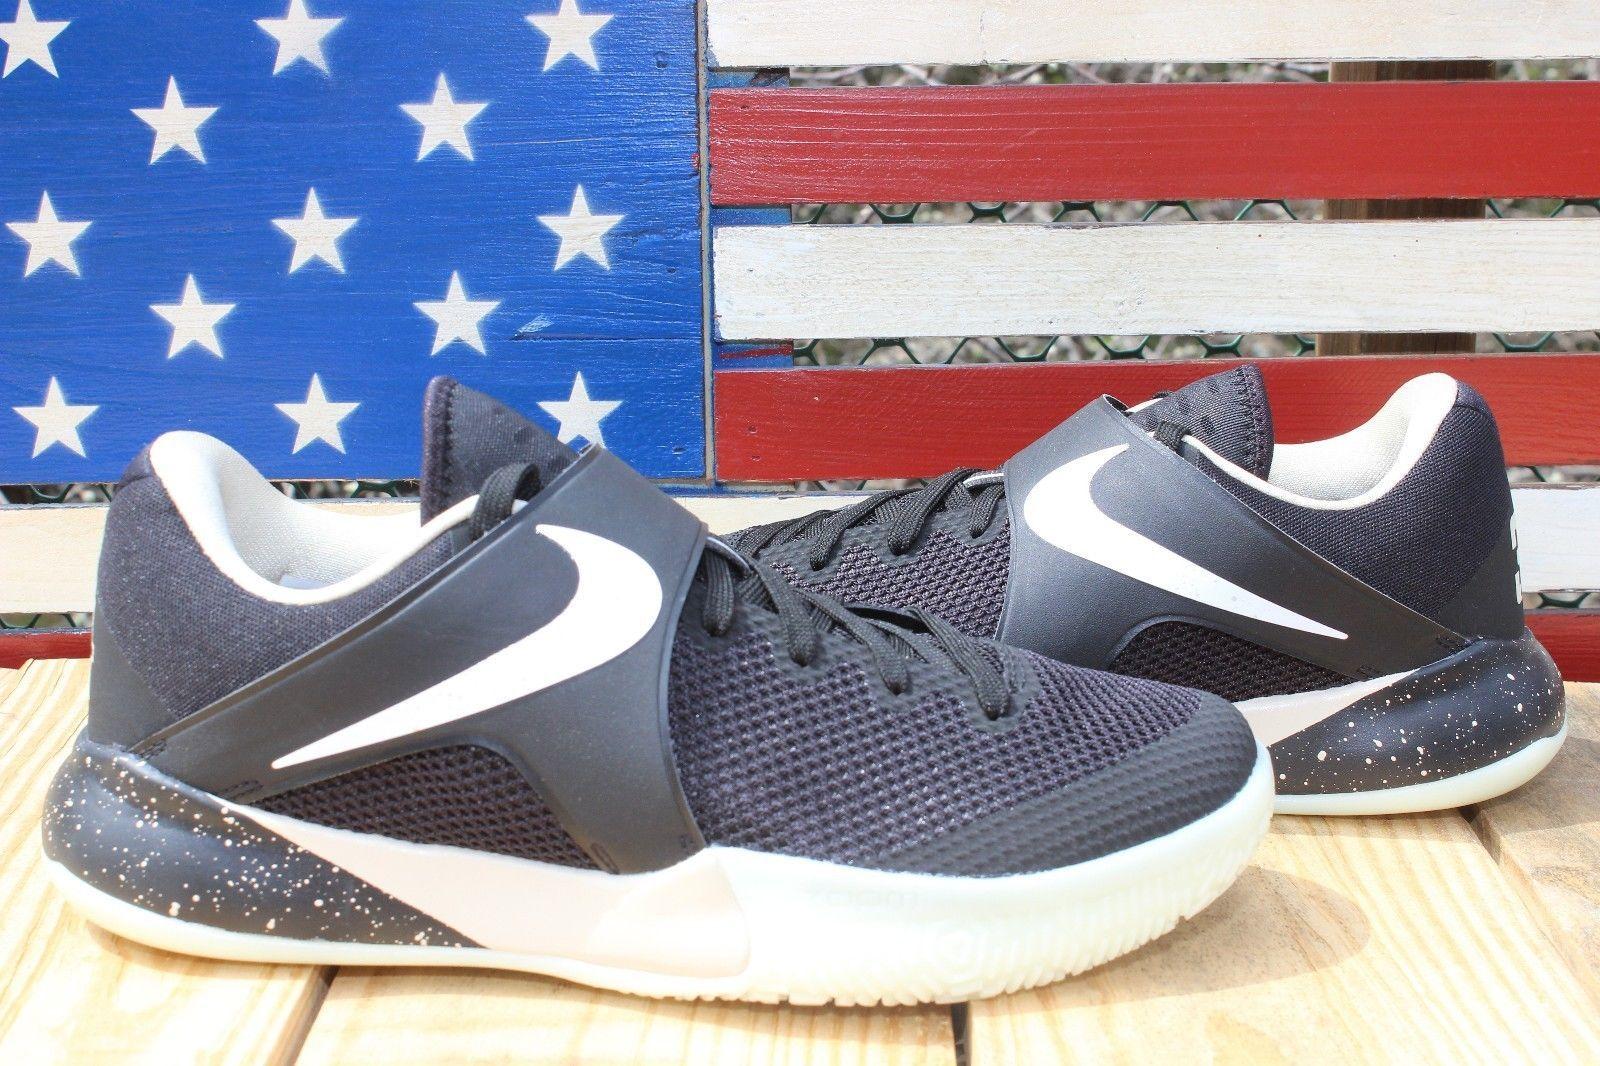 Nike Zoom Live PE 'Giannis Antetokounmpo' [910573-011] Glow NBA Basketball Shoes